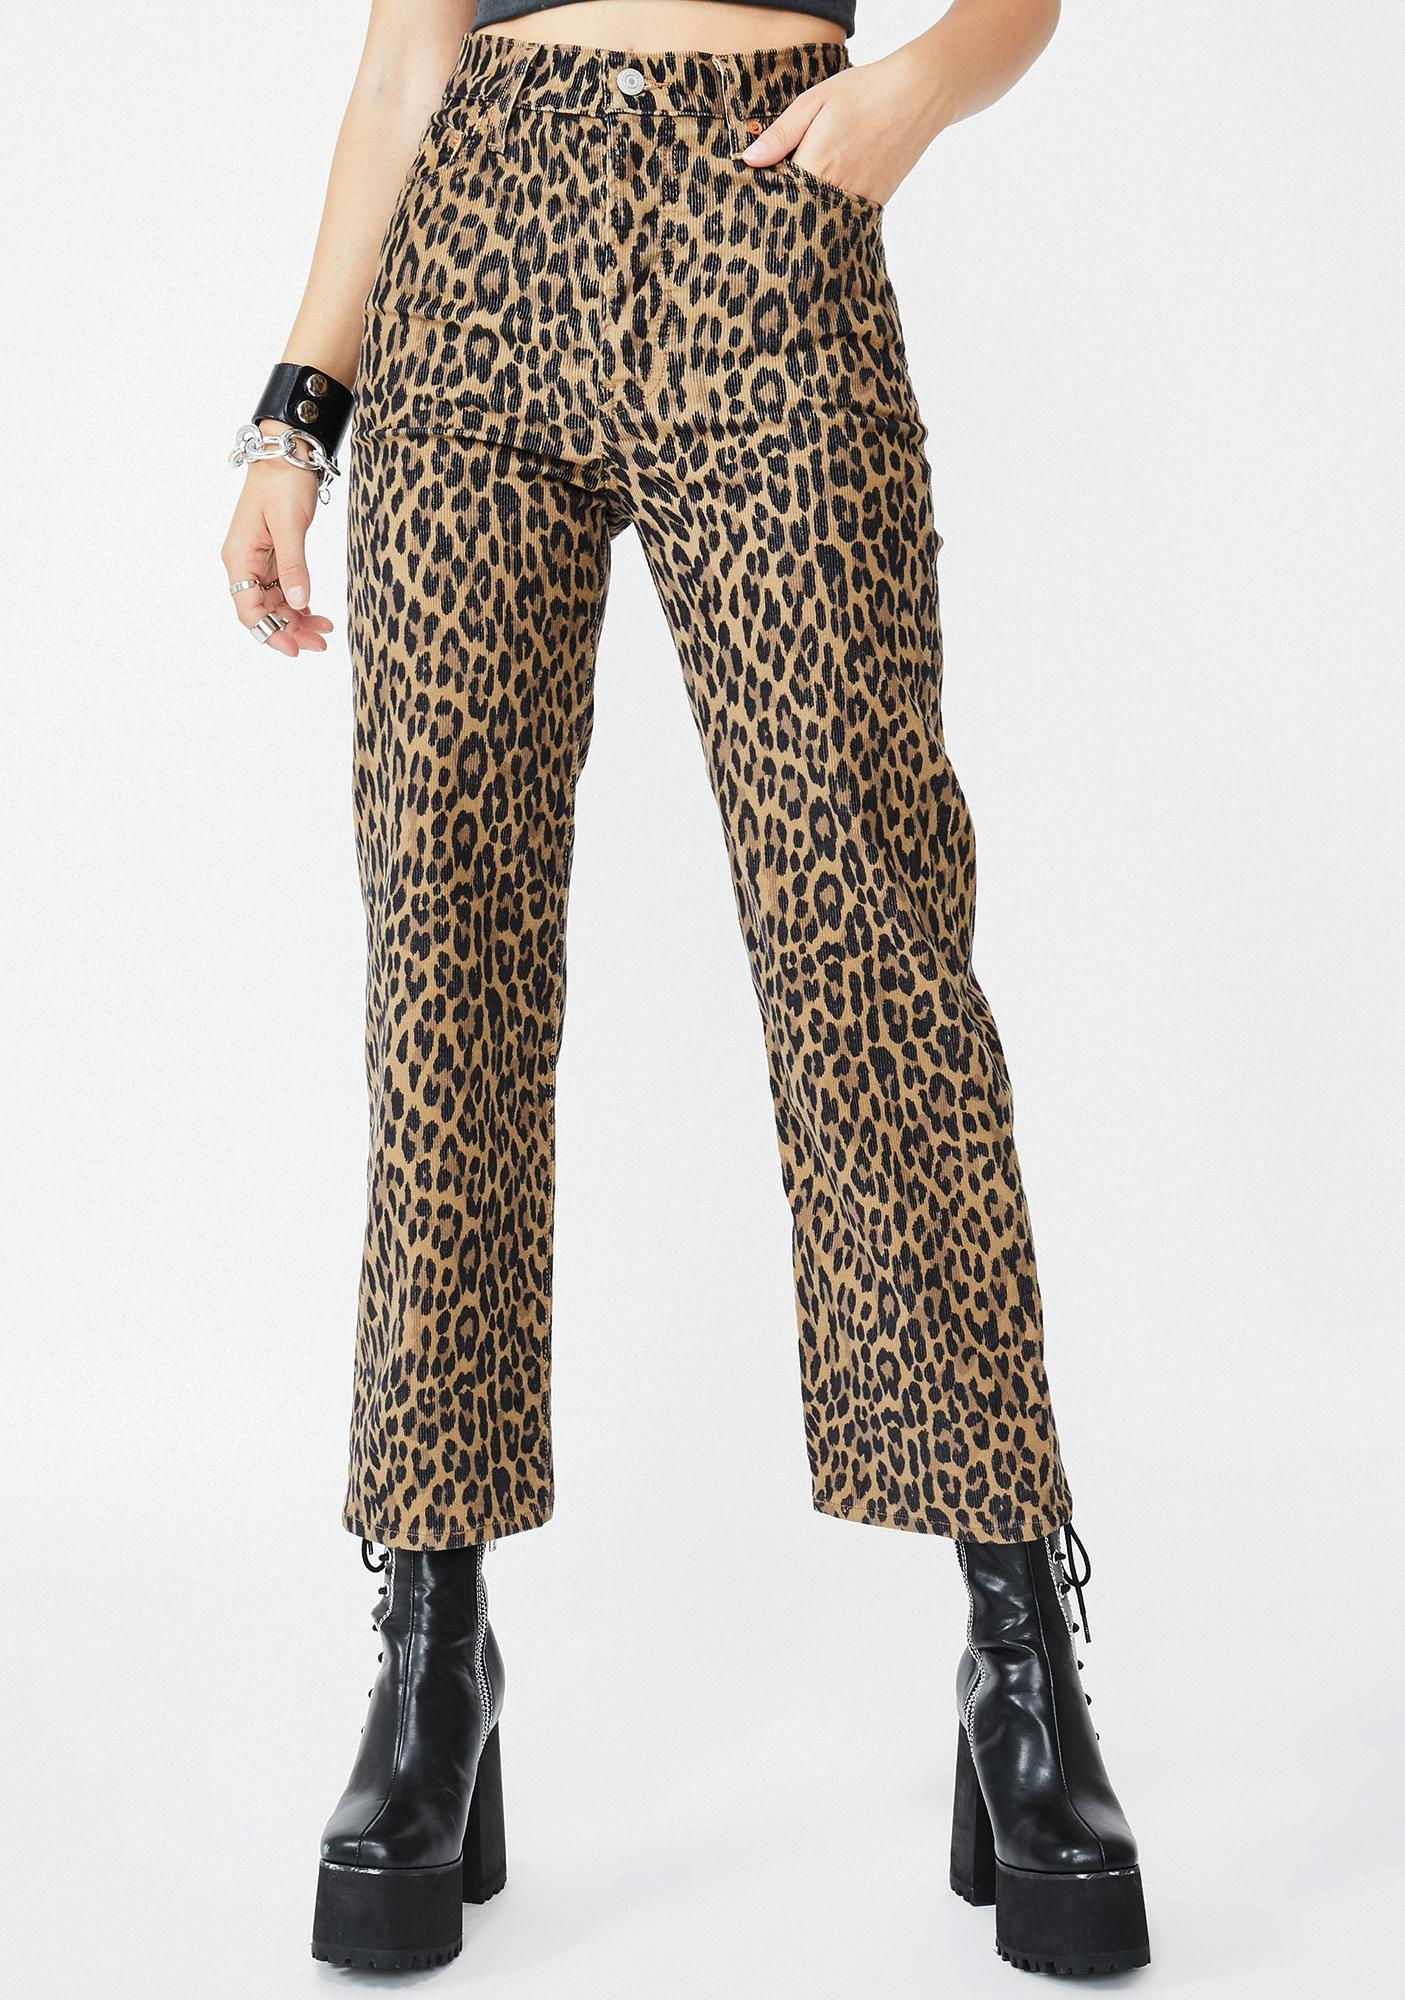 Gehu Leopard Corduroy Straight Leg Pants by Levis